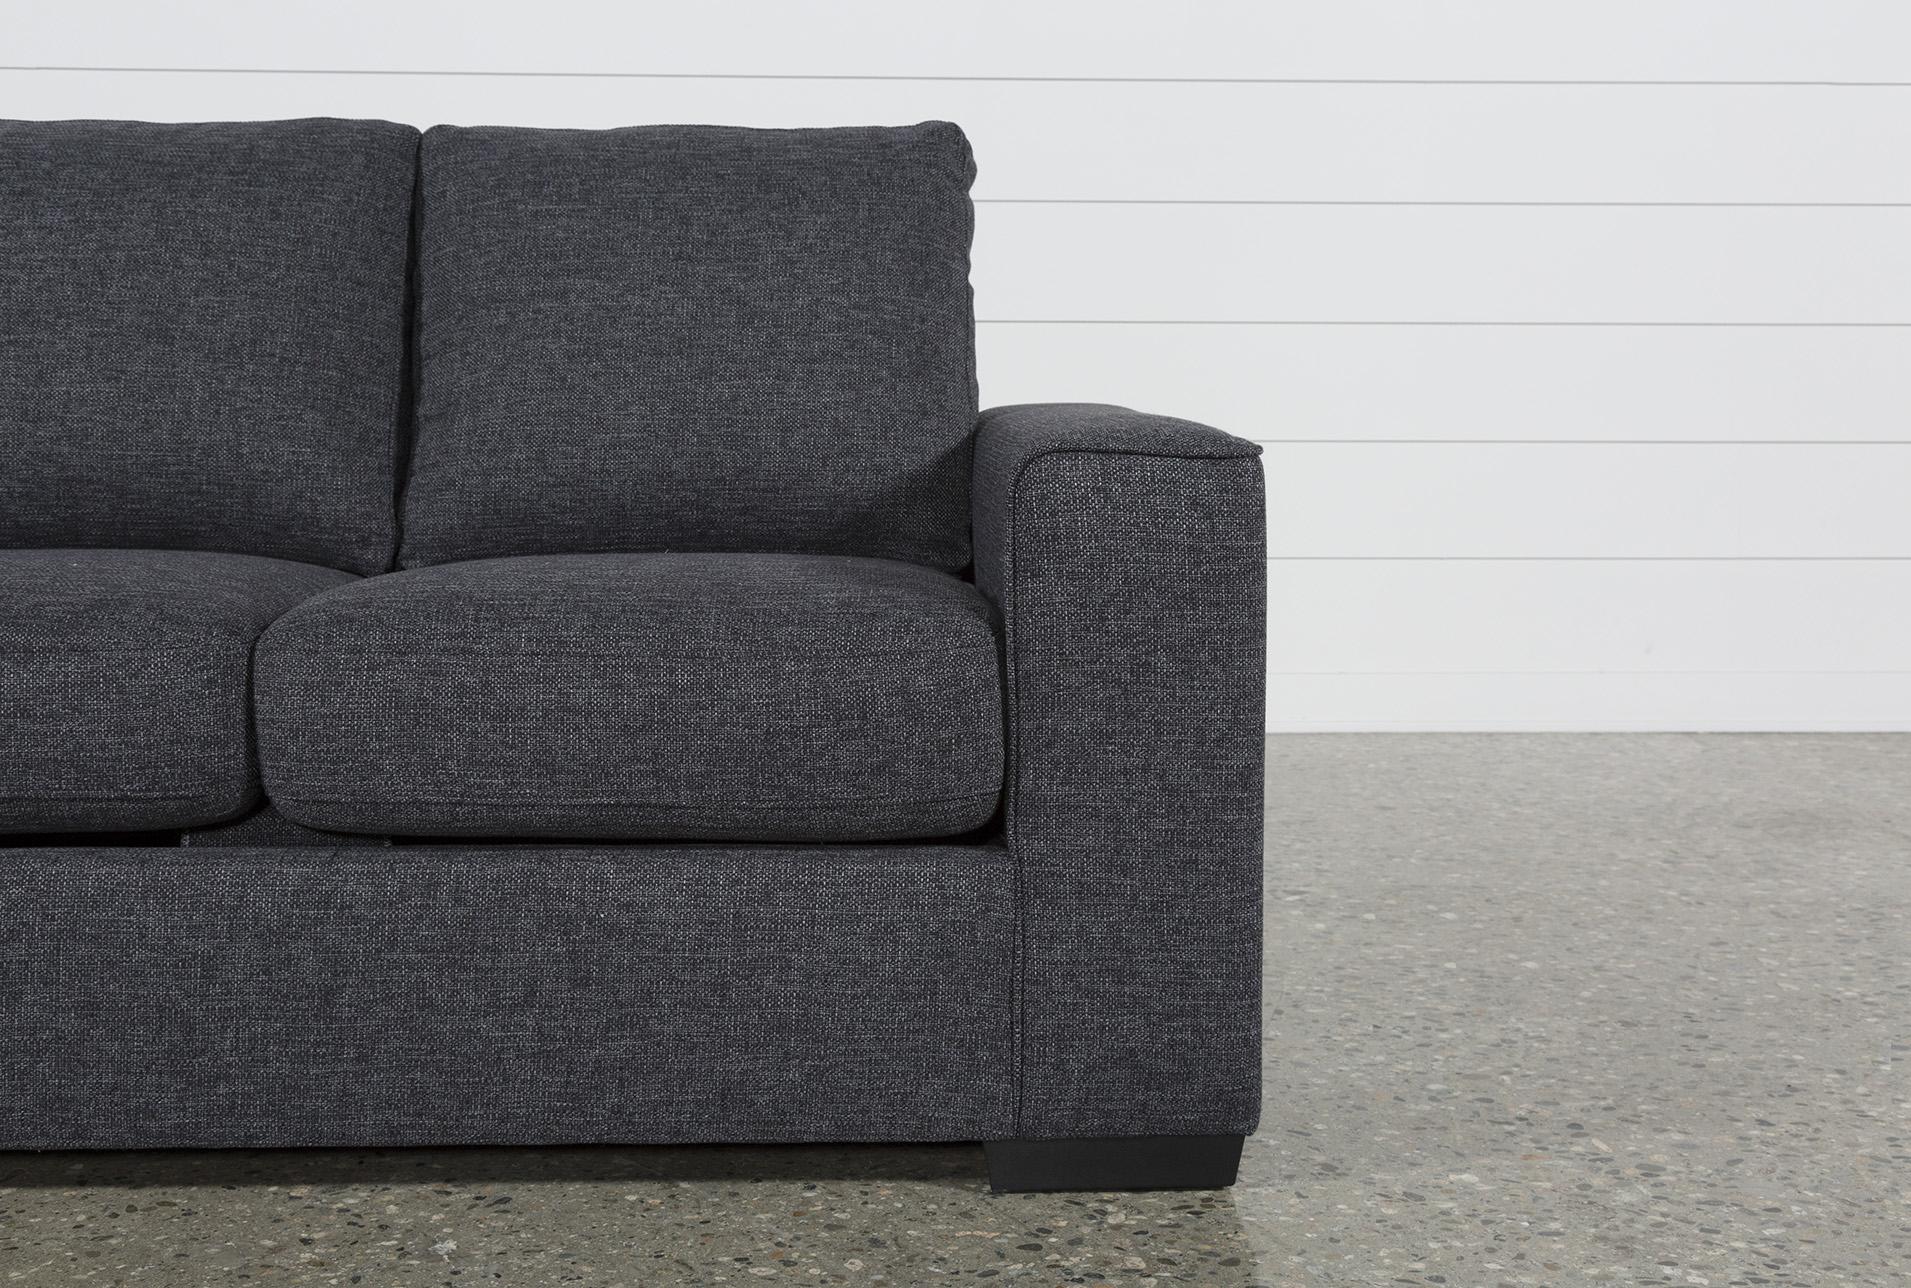 Lucy Dark Grey Queen Sleeper | Products | Pinterest | Dark Grey And Throughout Lucy Dark Grey Sofa Chairs (Image 19 of 25)